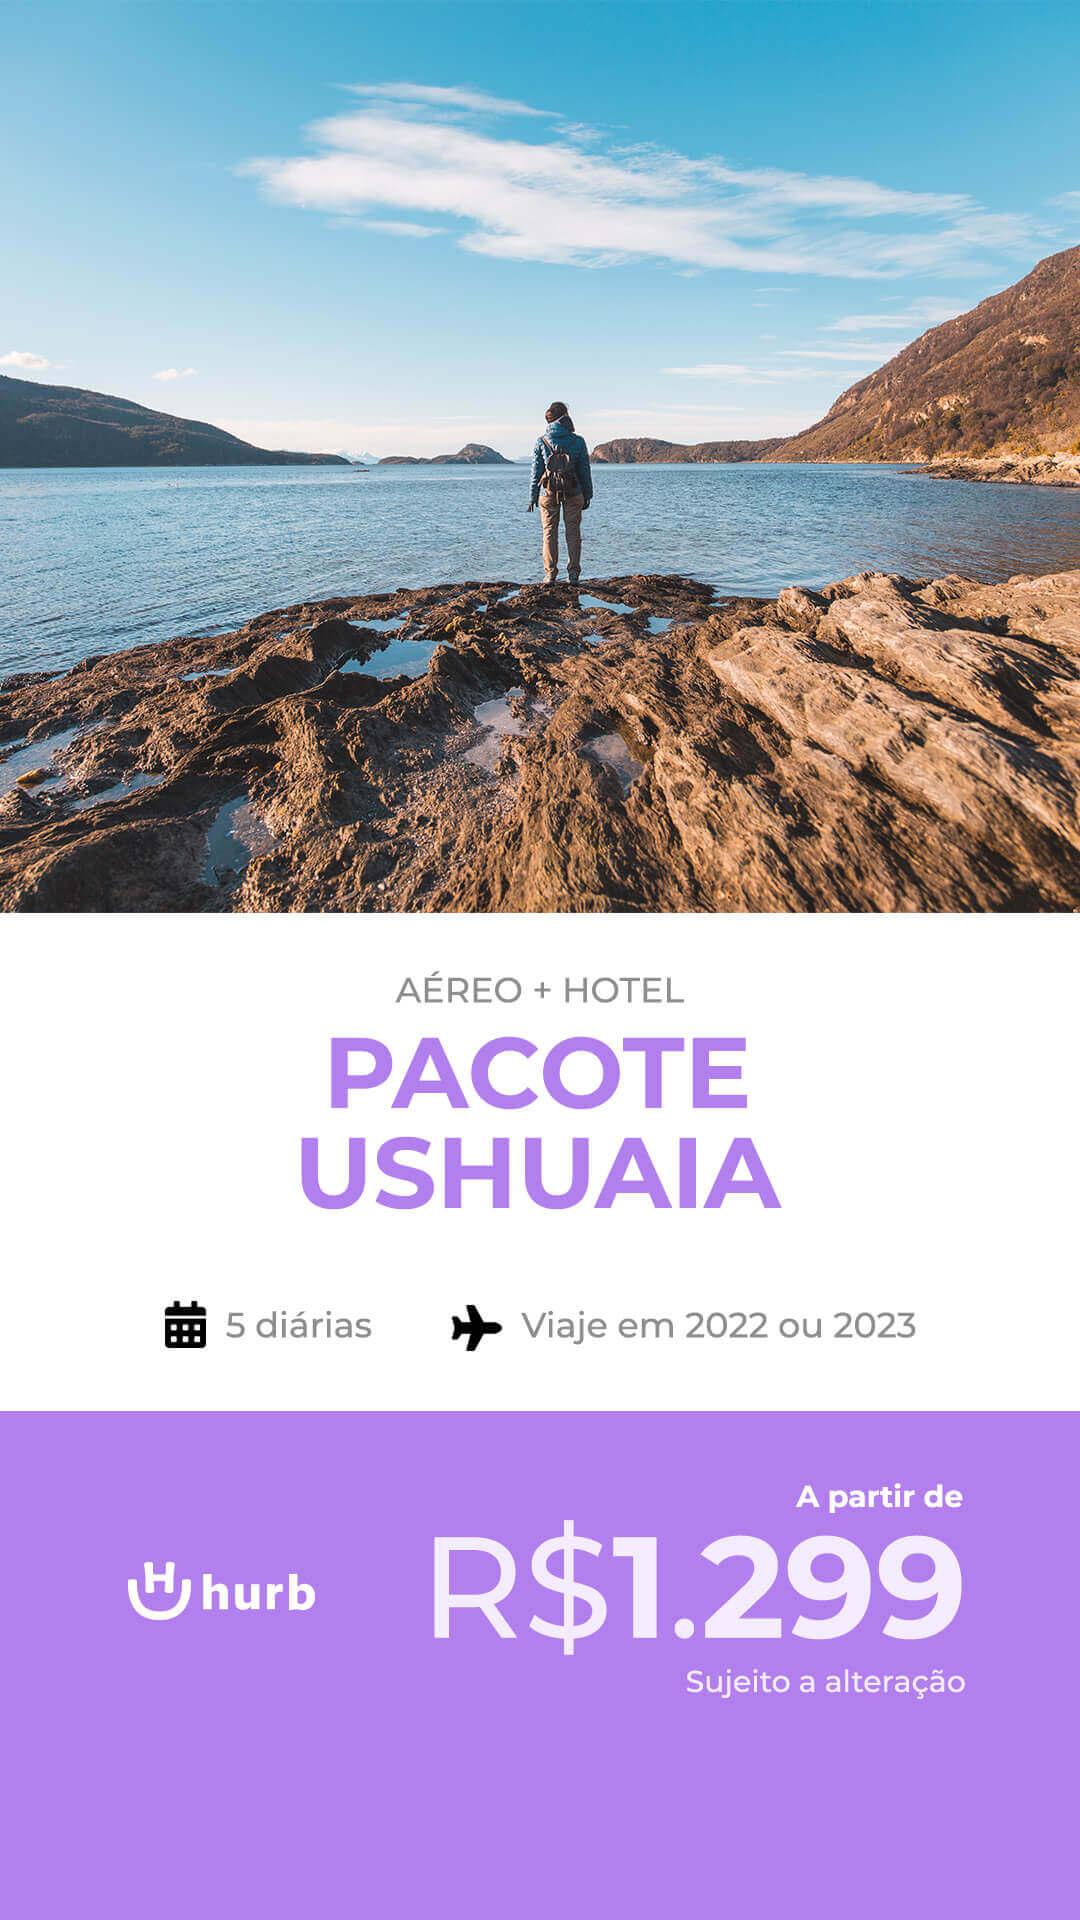 pacote ushuaia 2022 e 2023